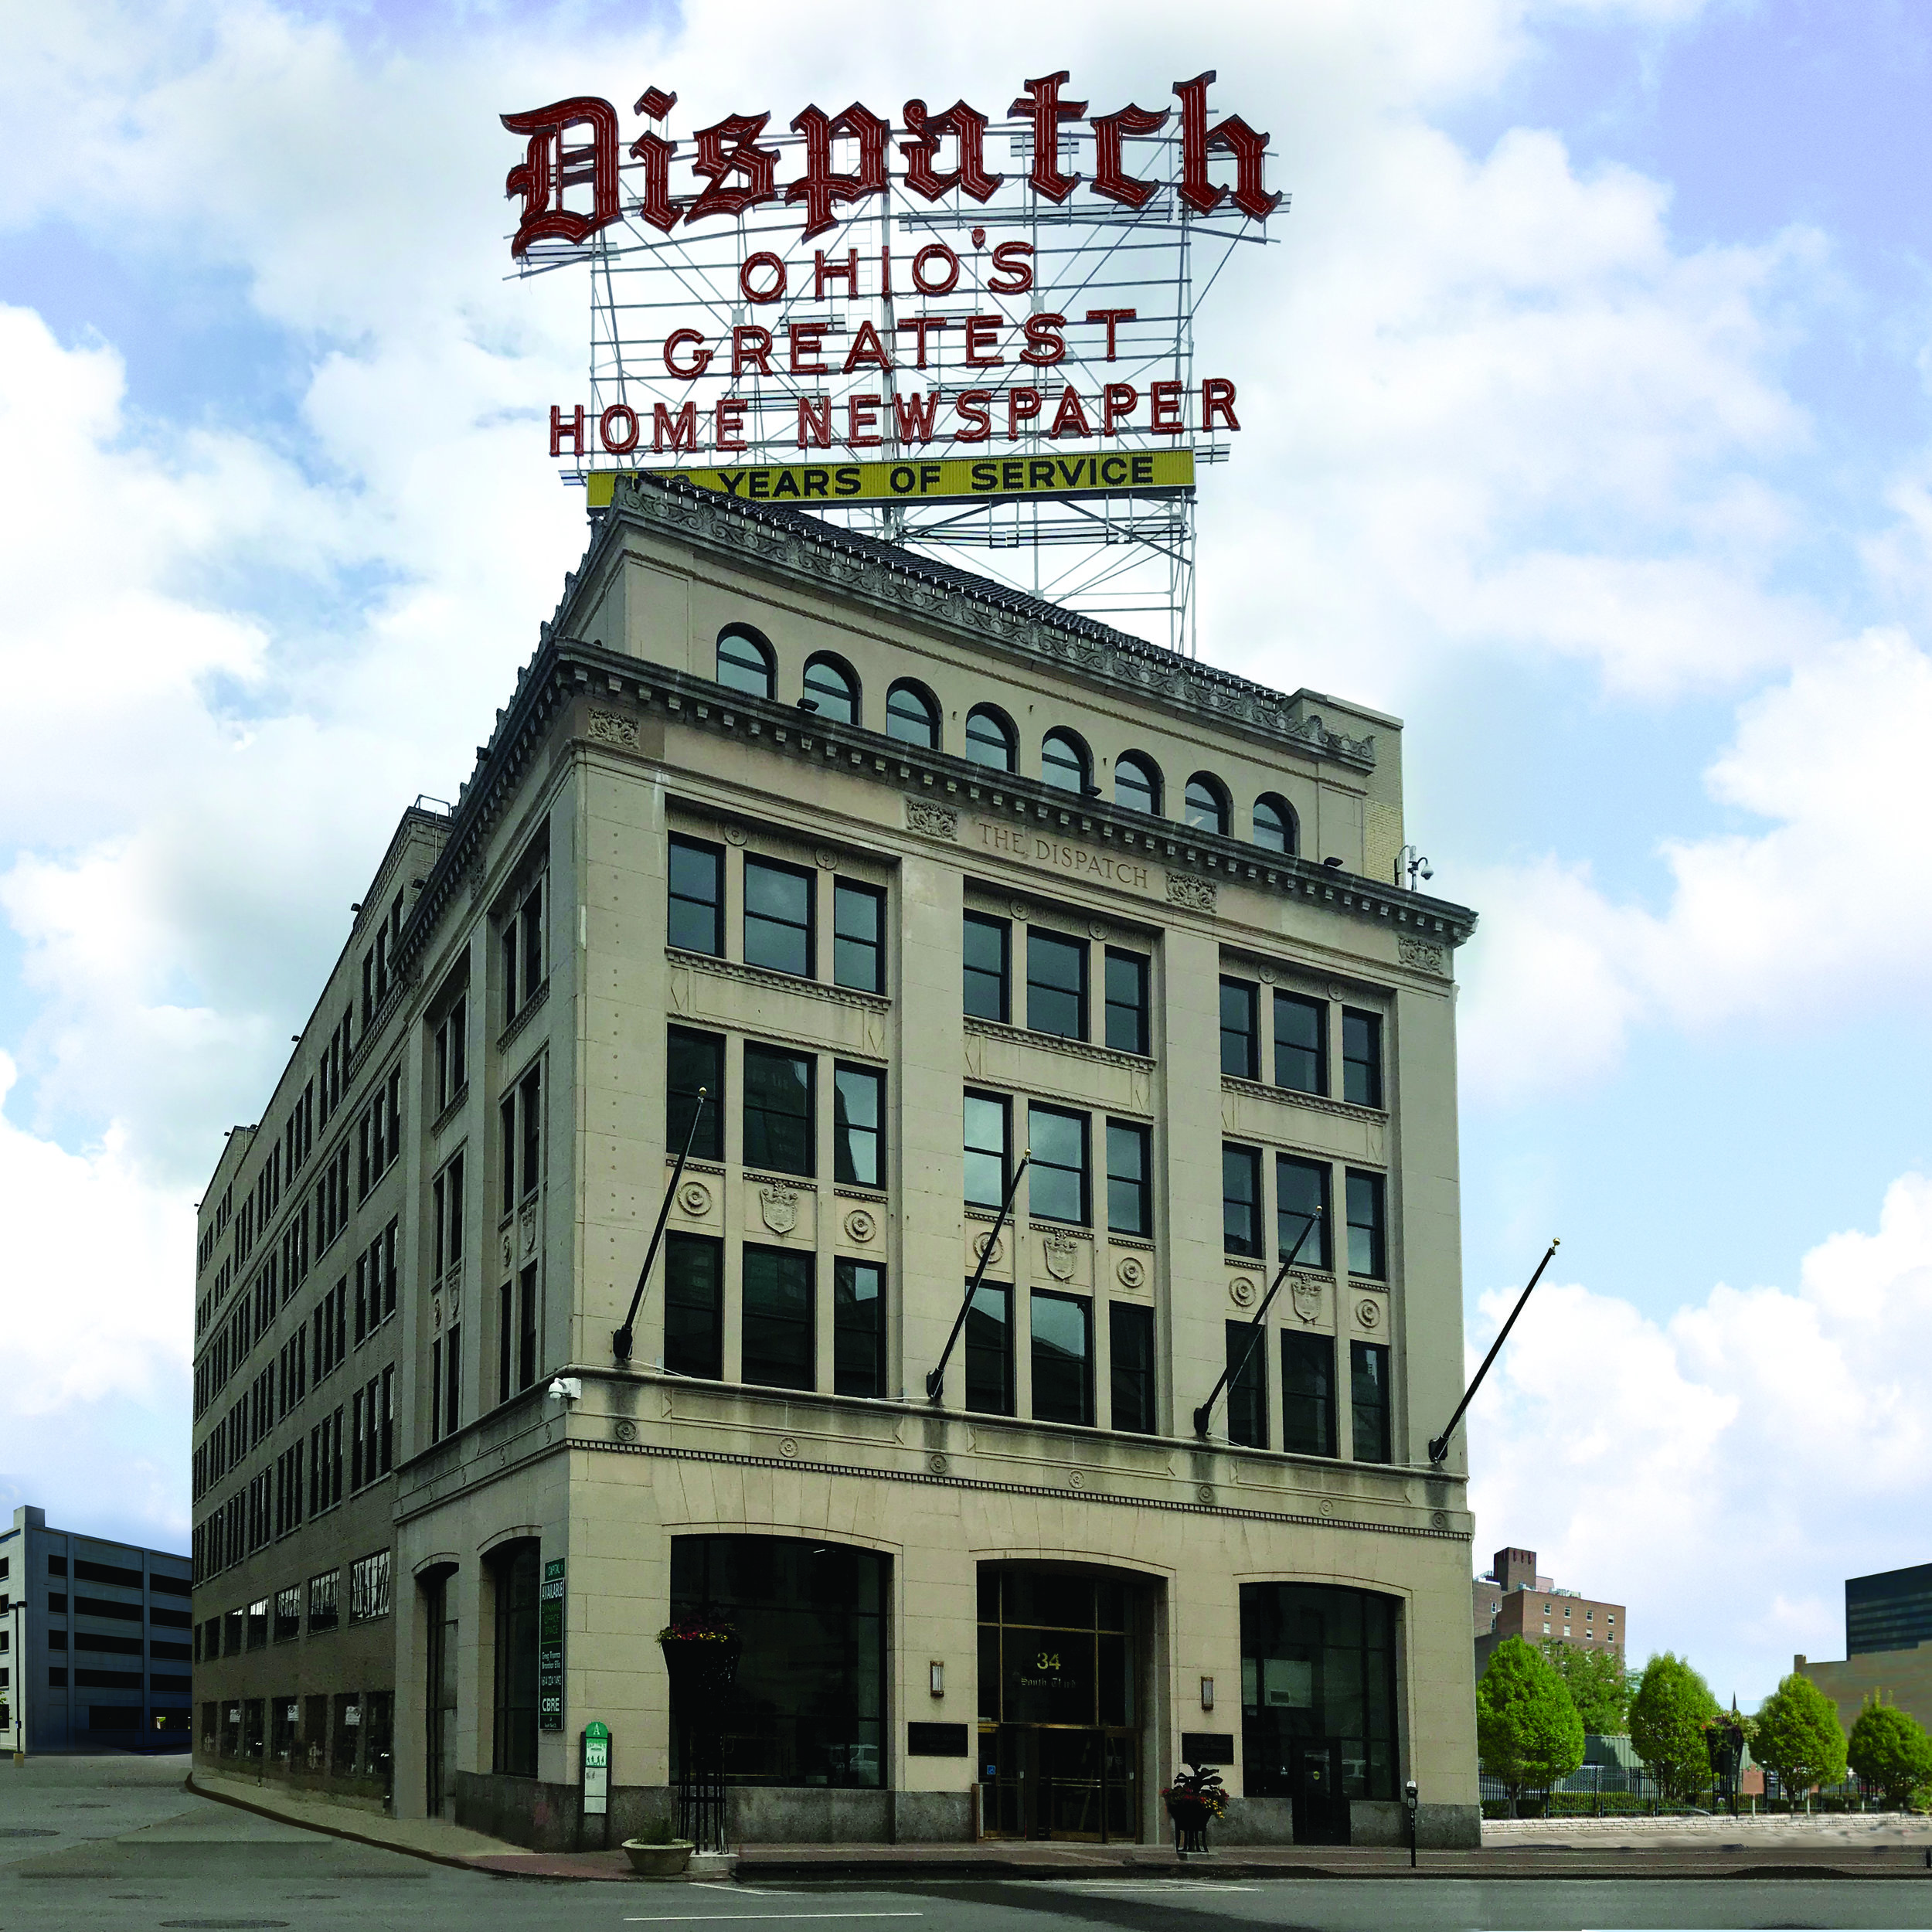 Columbus Dispatch Building